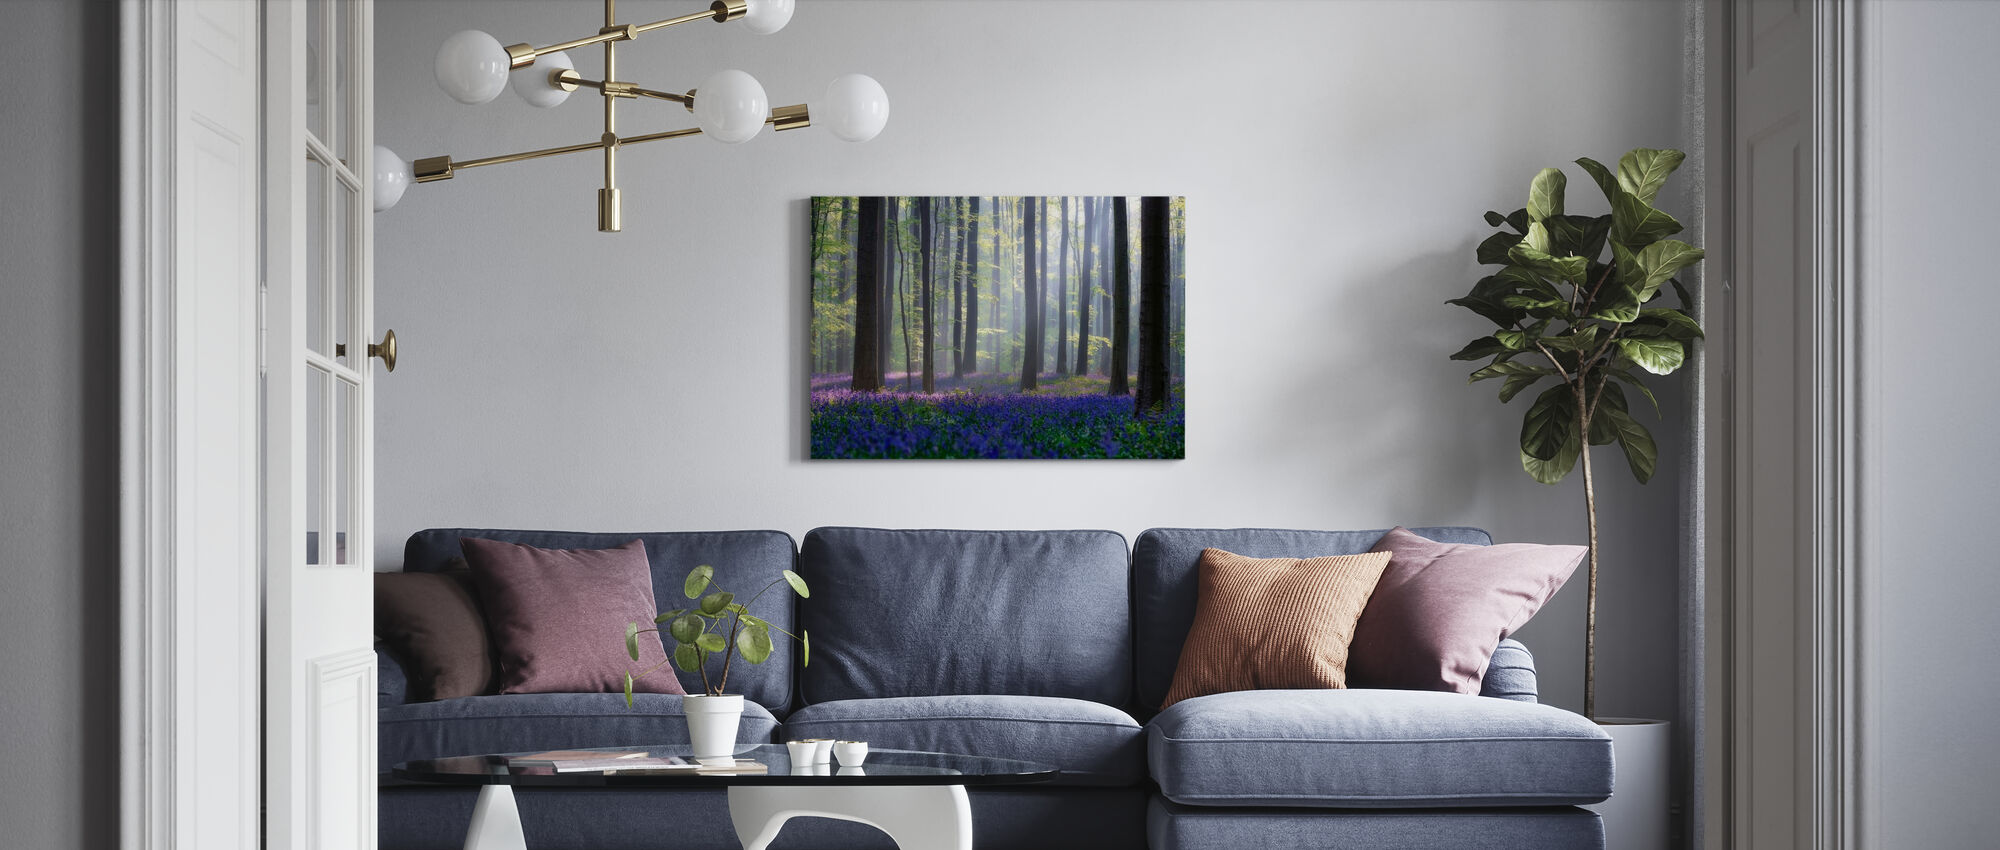 Blåklockor - Canvastavla - Vardagsrum